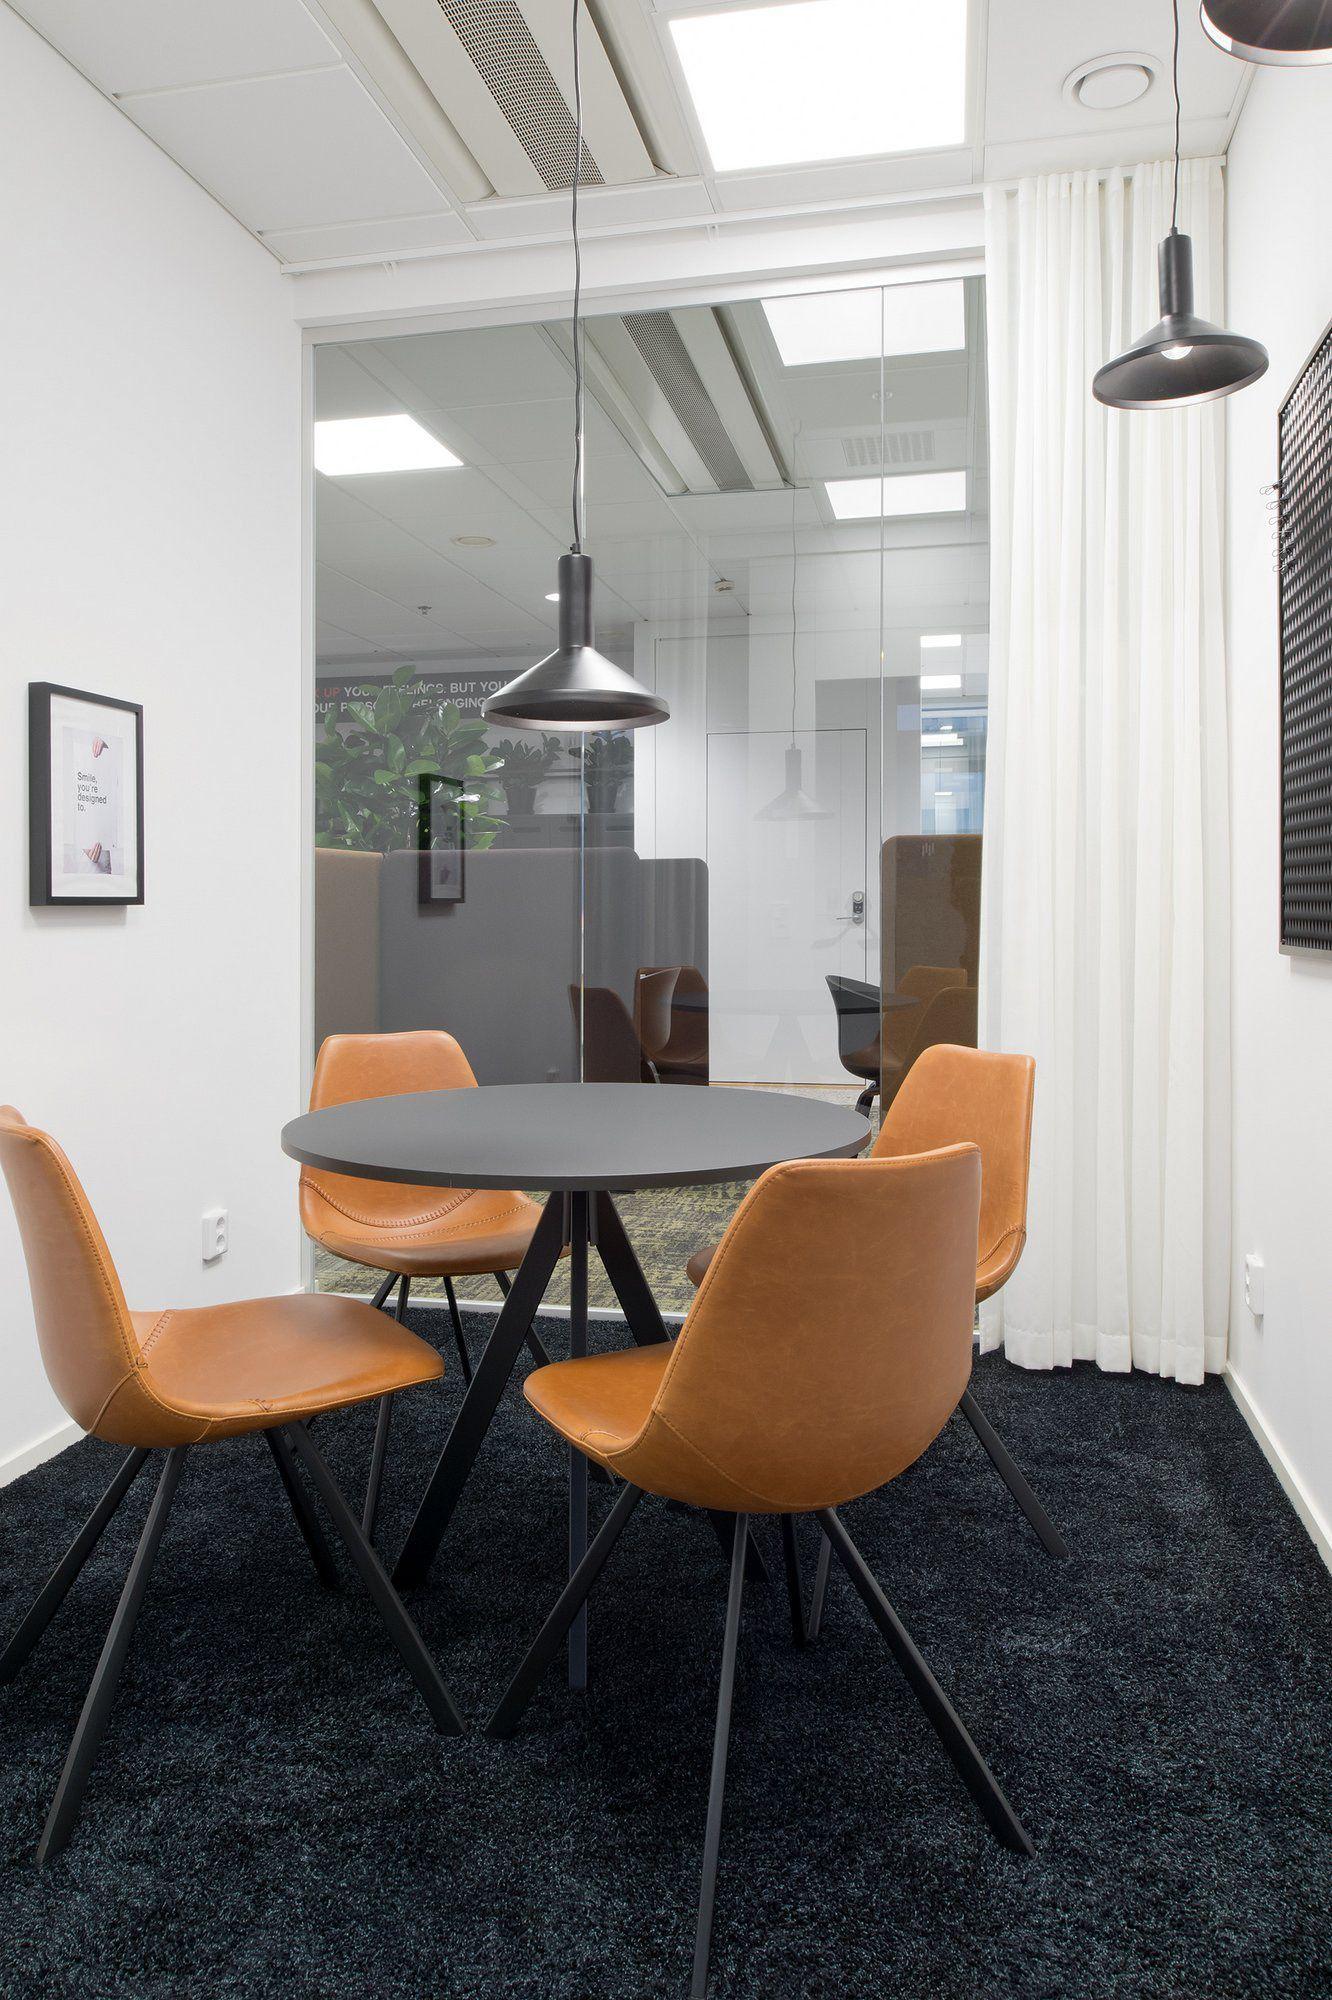 Conference Room Design Ideas: Office Tour: Bricks Lund Offices – Lund